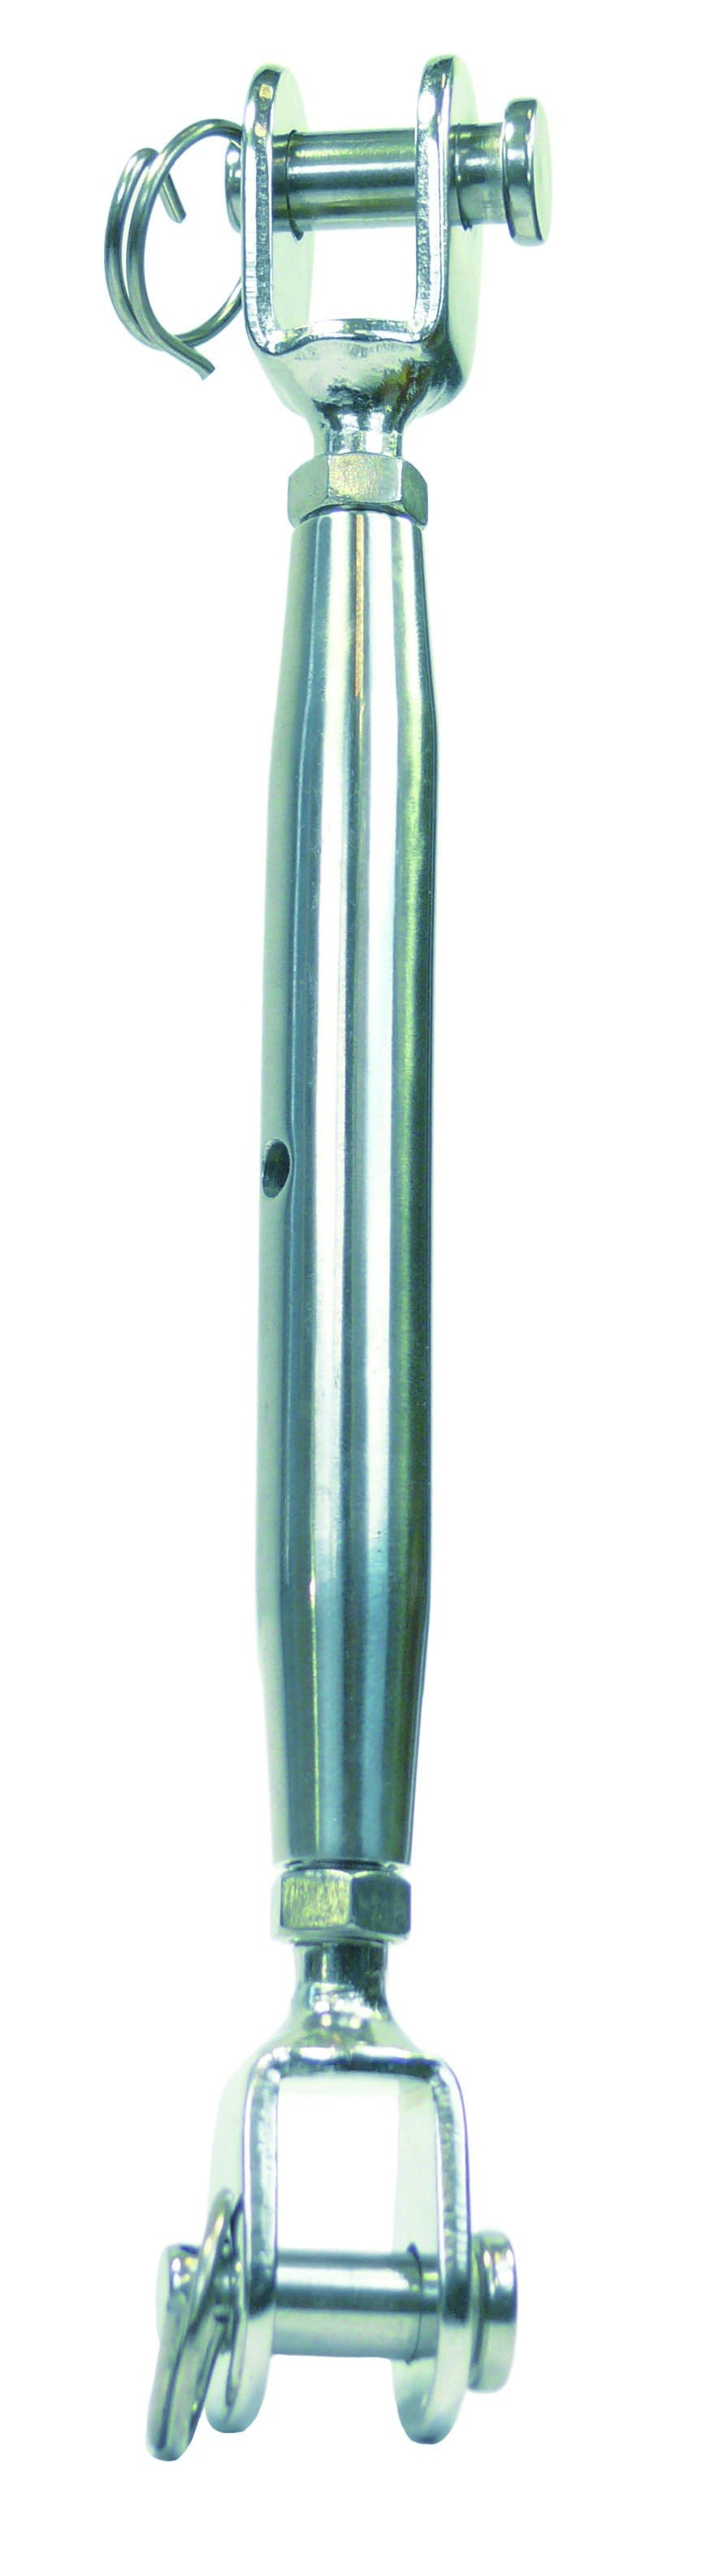 Wantspanner gaffel-gaffel M8 RVS A4 1 stuks